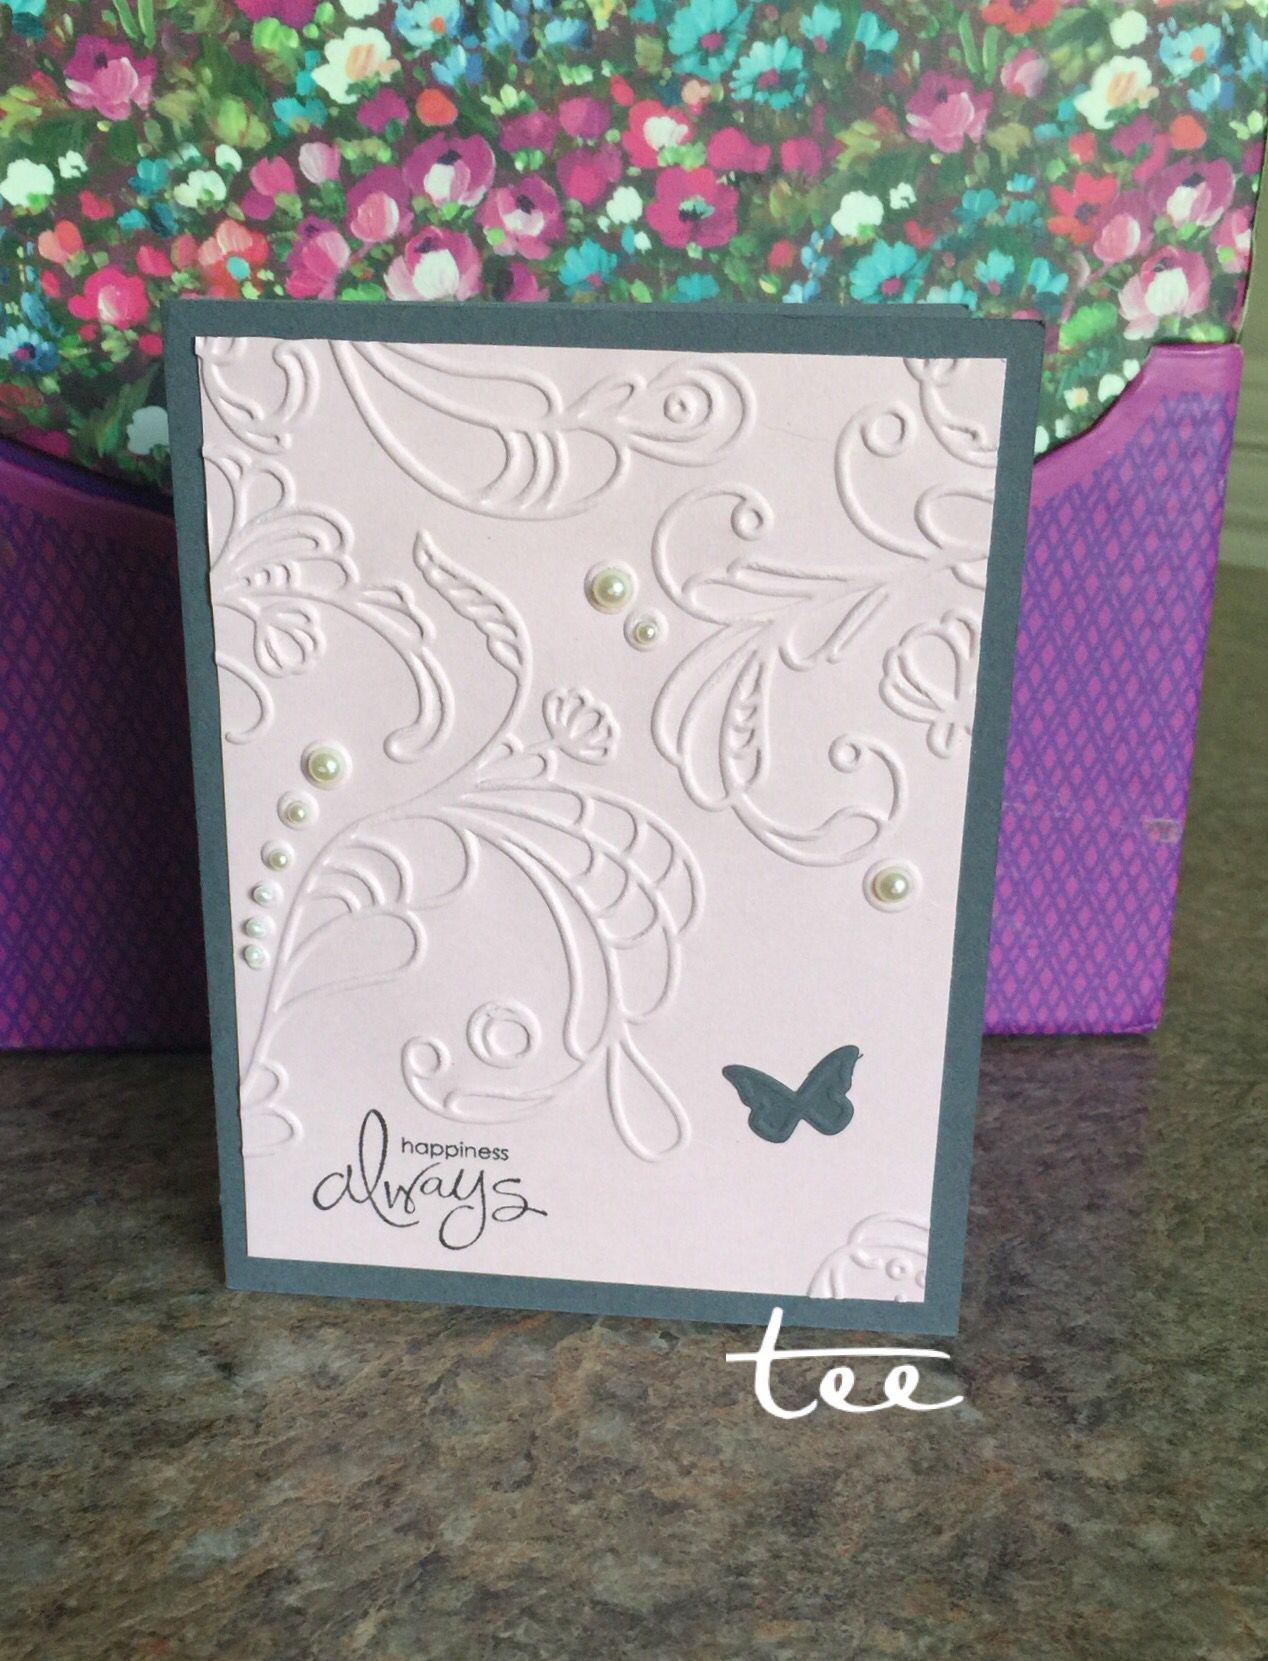 Bridal showerwedding card homemade cards crafts u gifts